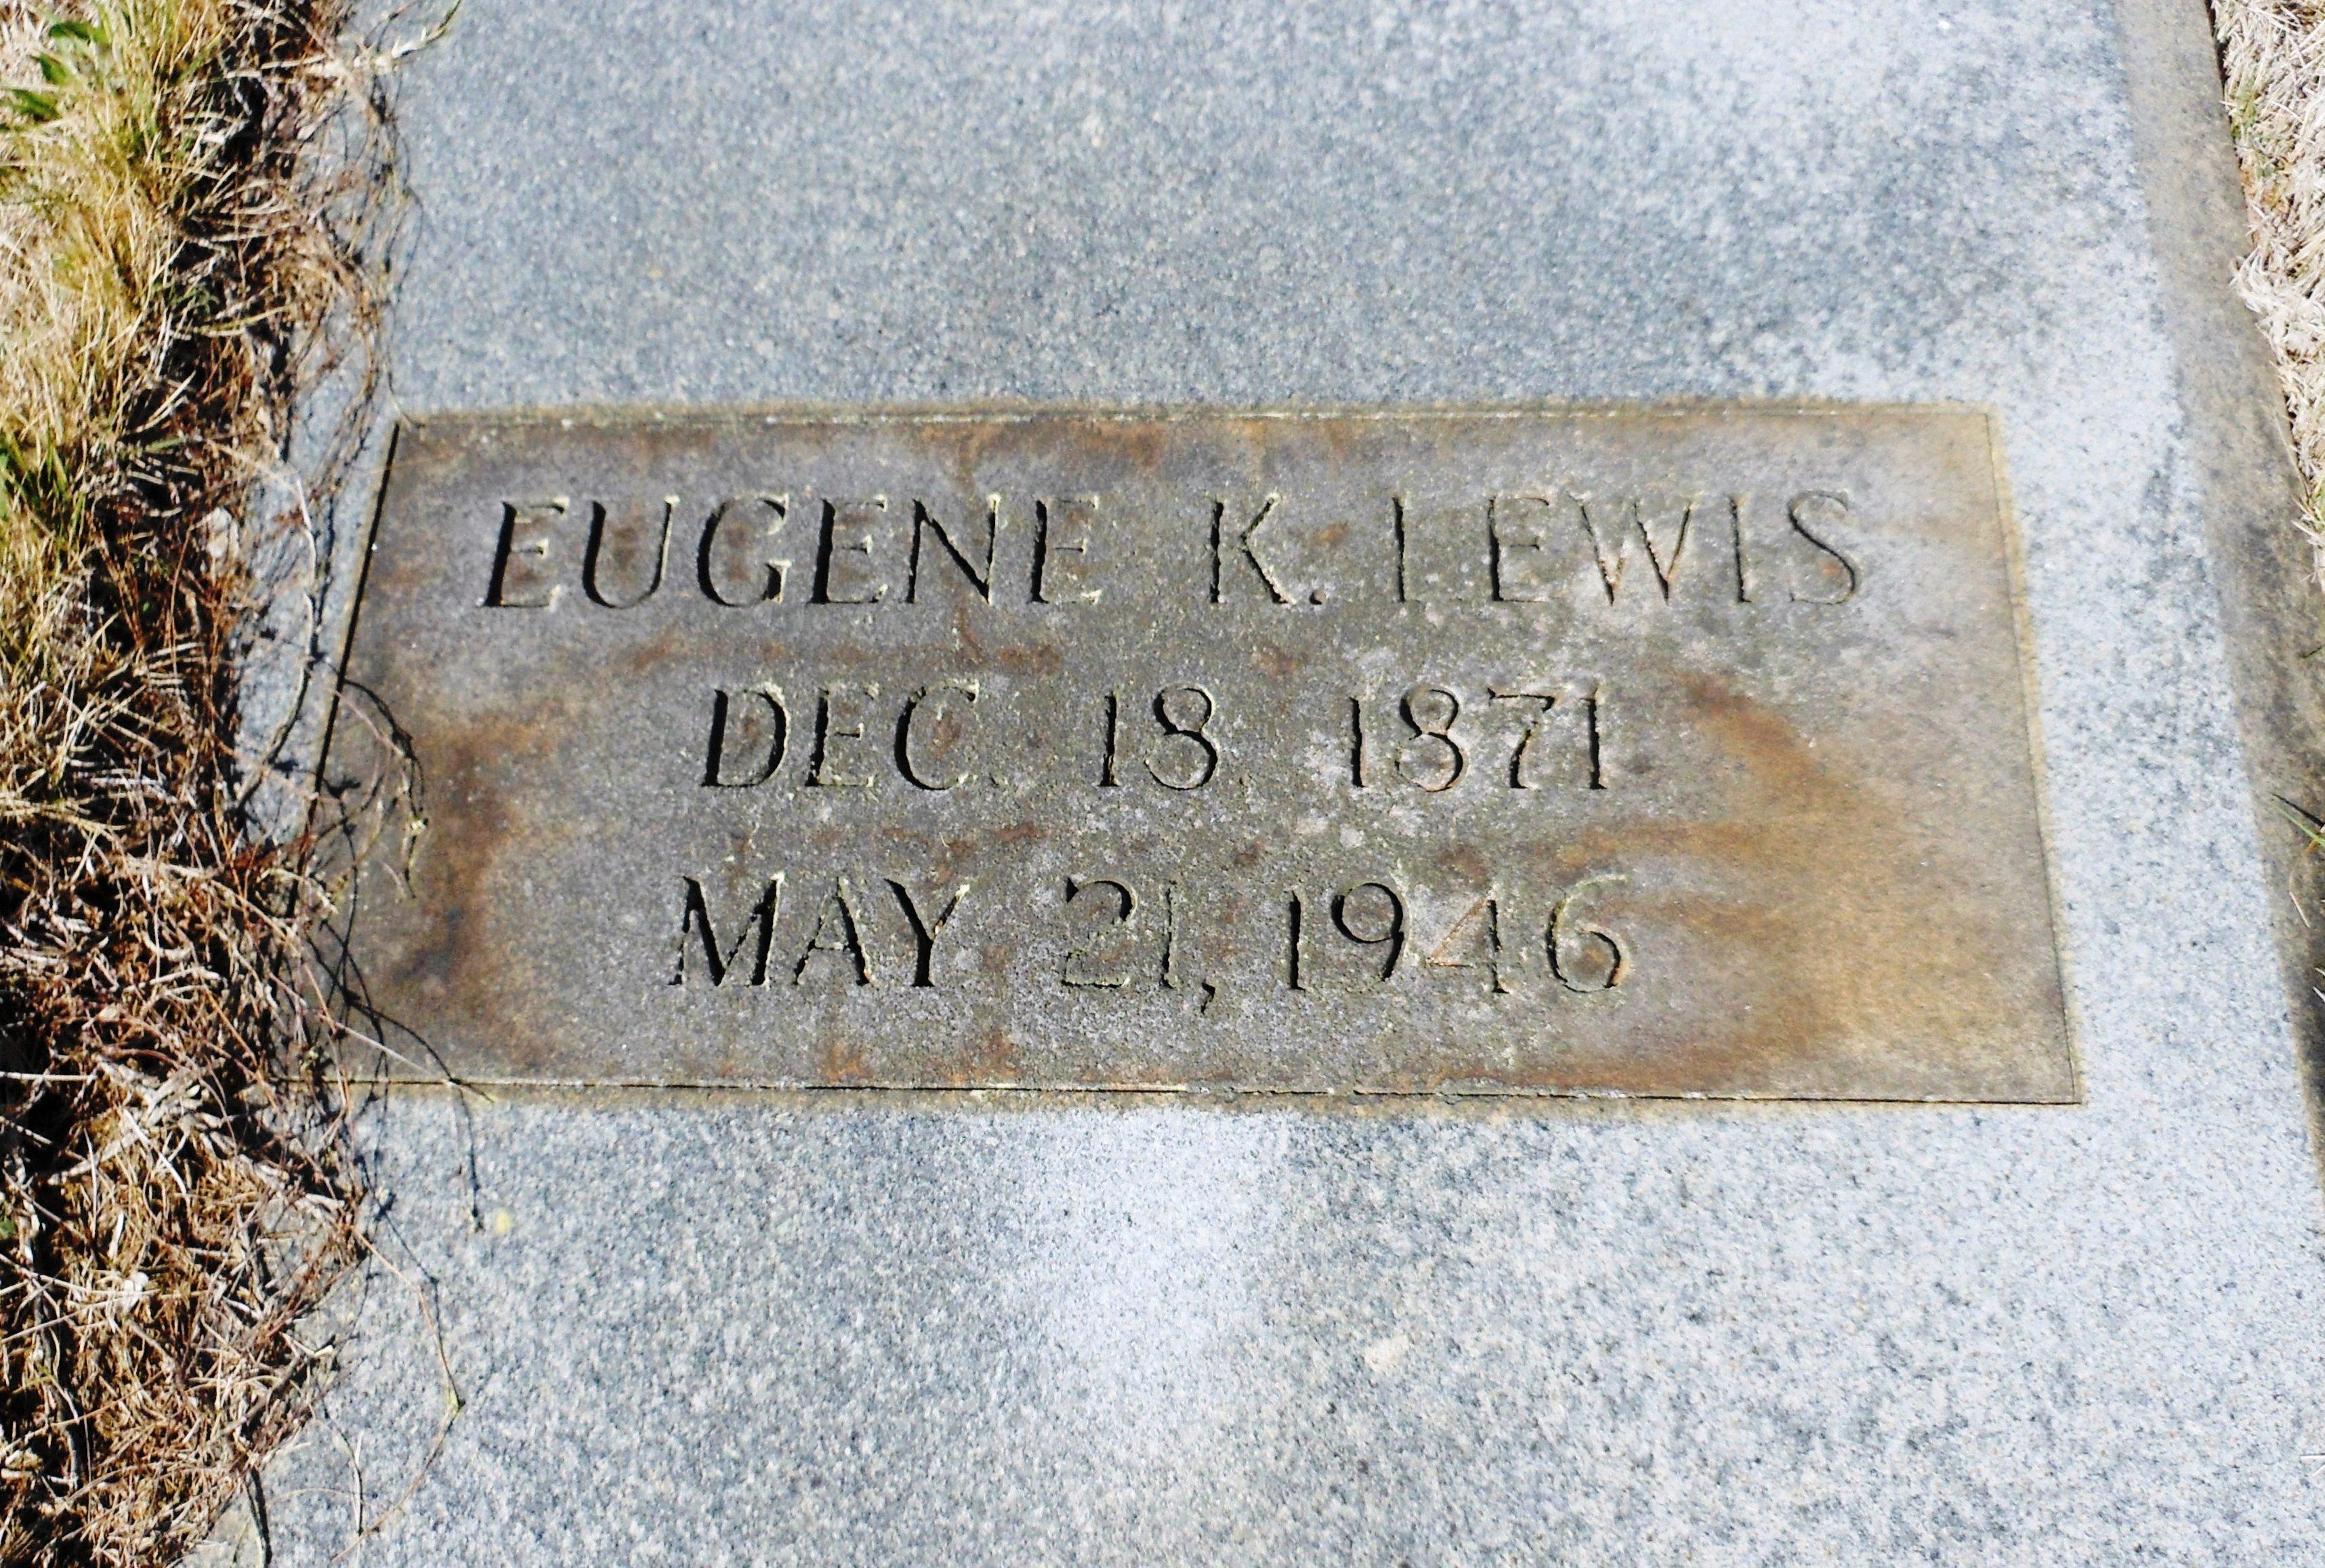 Eugene K Lewis